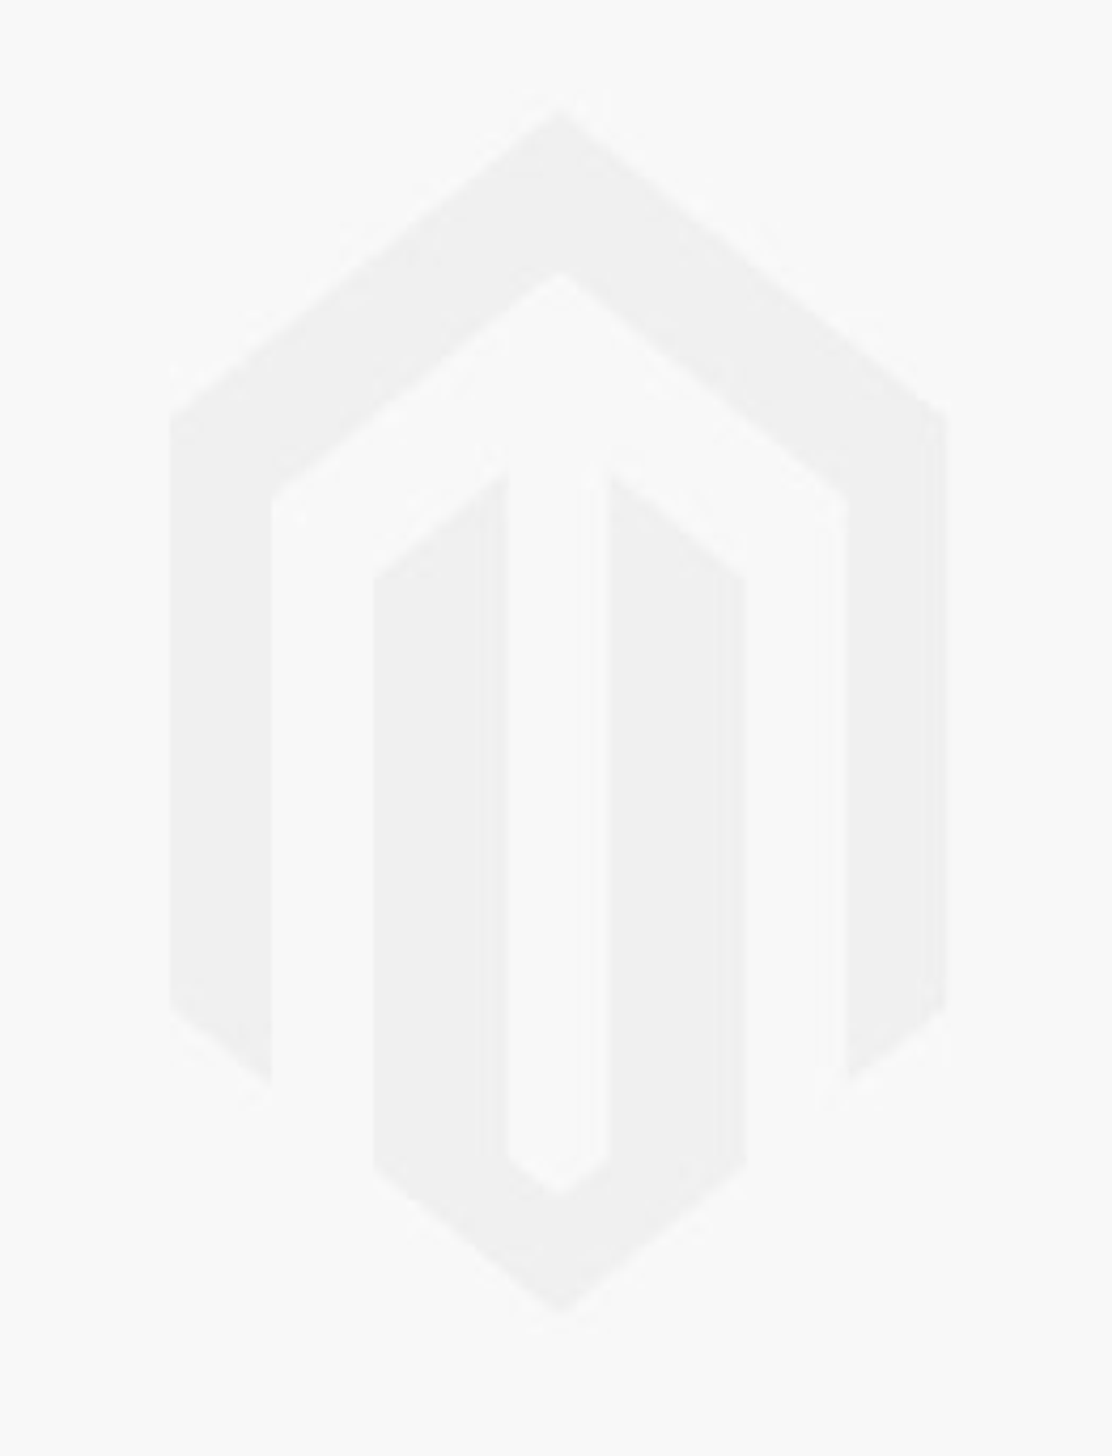 3 x 1.5mm Engraved Marquise Small Diamond Lotus Design Traditional Stud Image #1